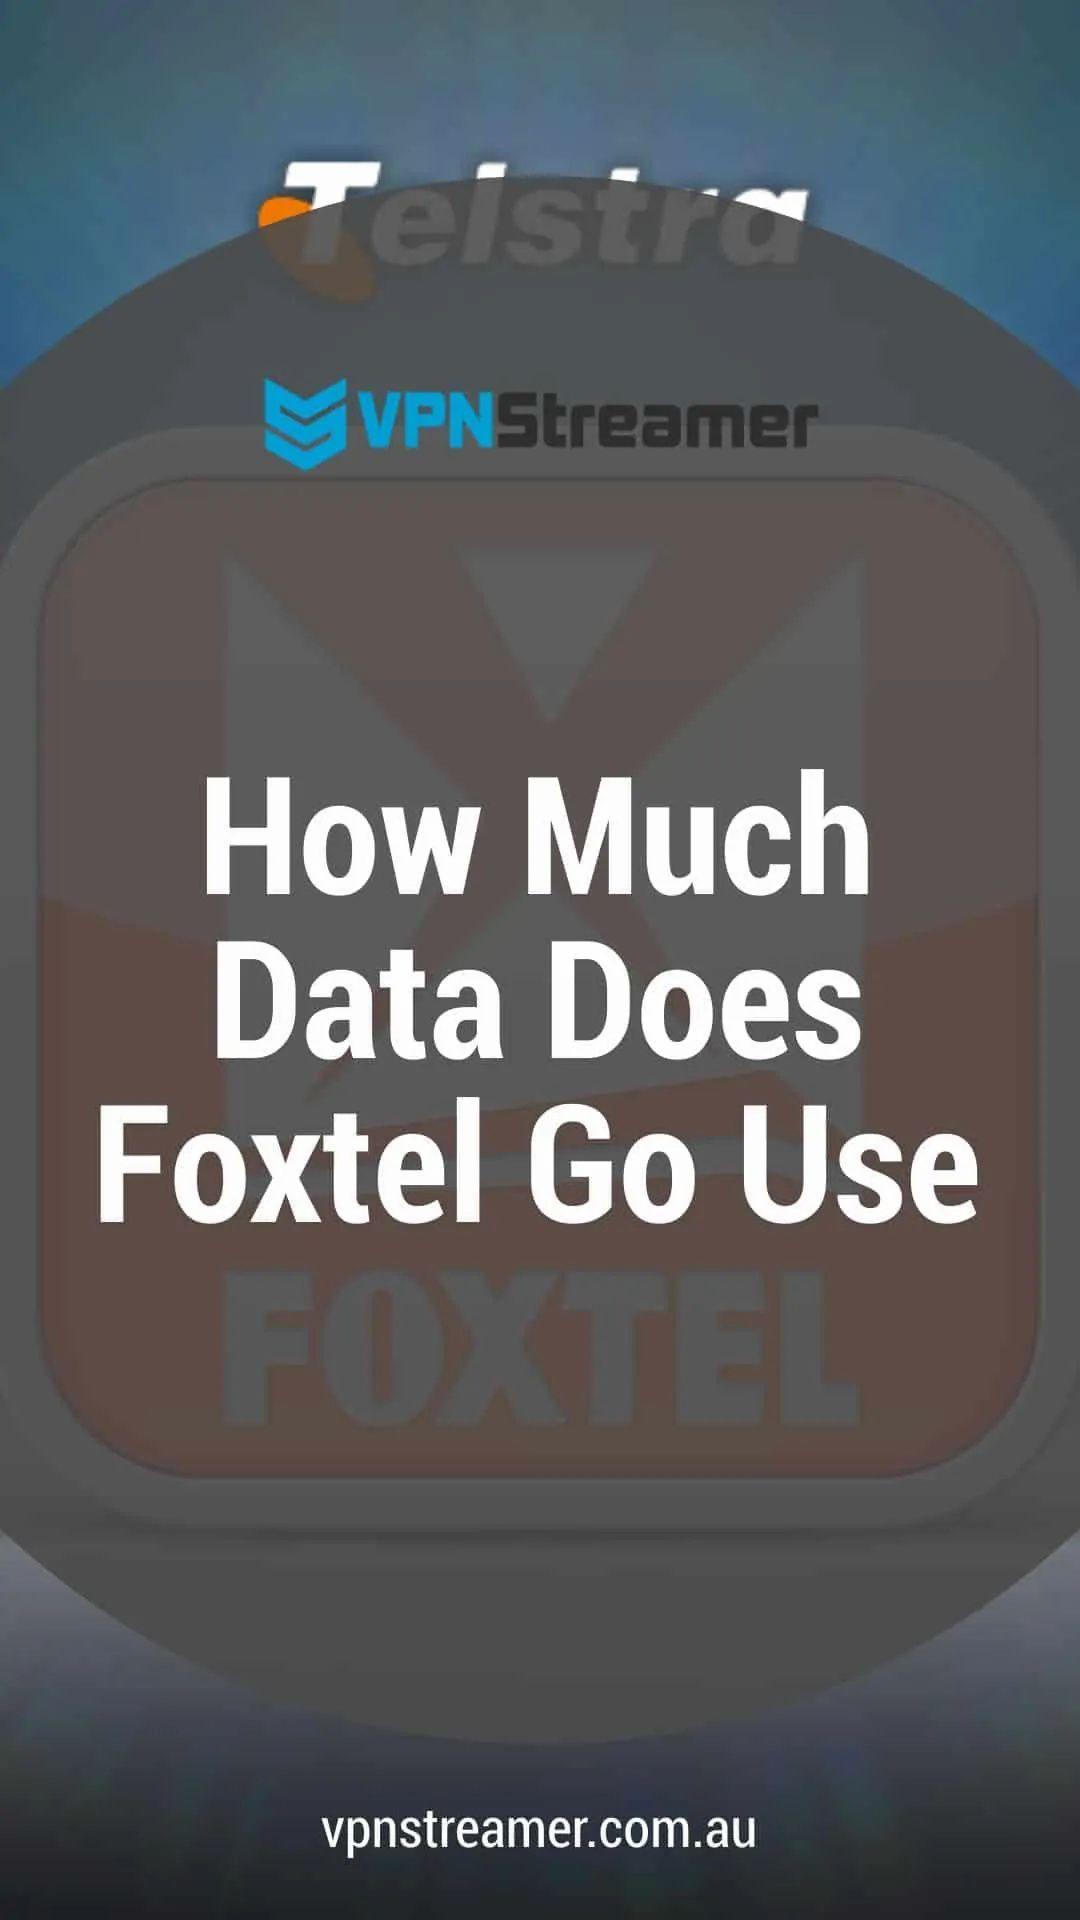 ef06751c83102e4f2ea7ea2160a80bbe - How Much Data Does Vpn Use